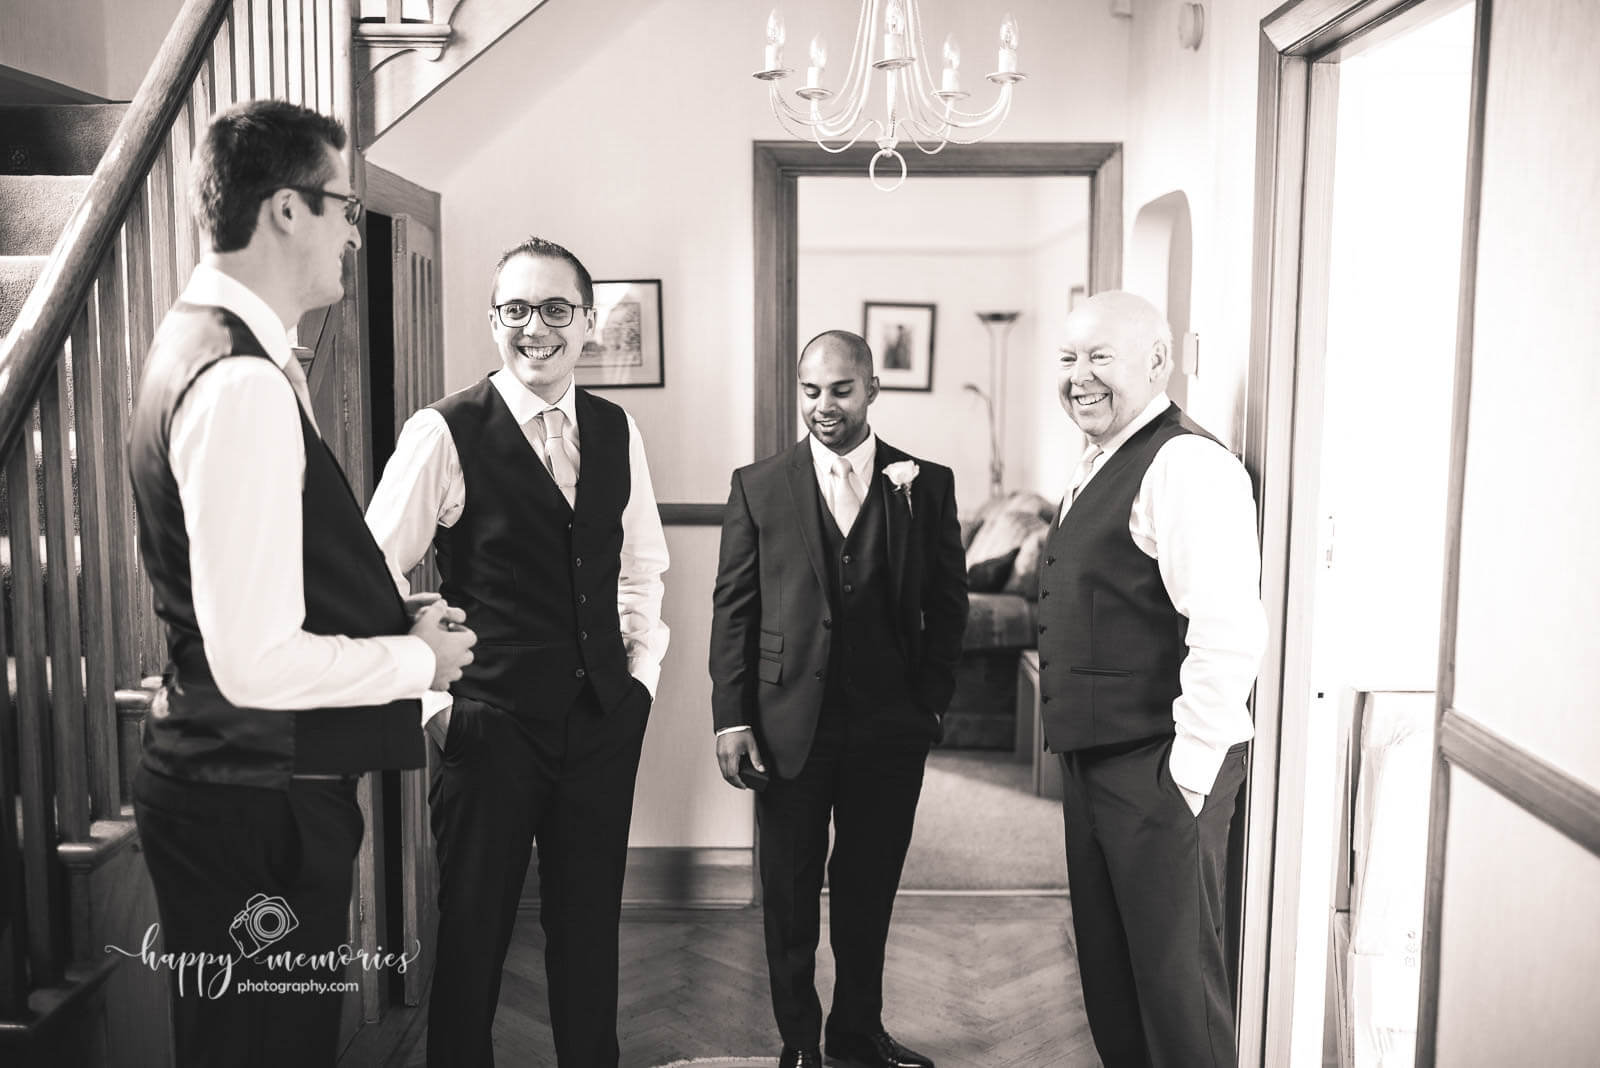 Wedding photographer East Grinstead-14